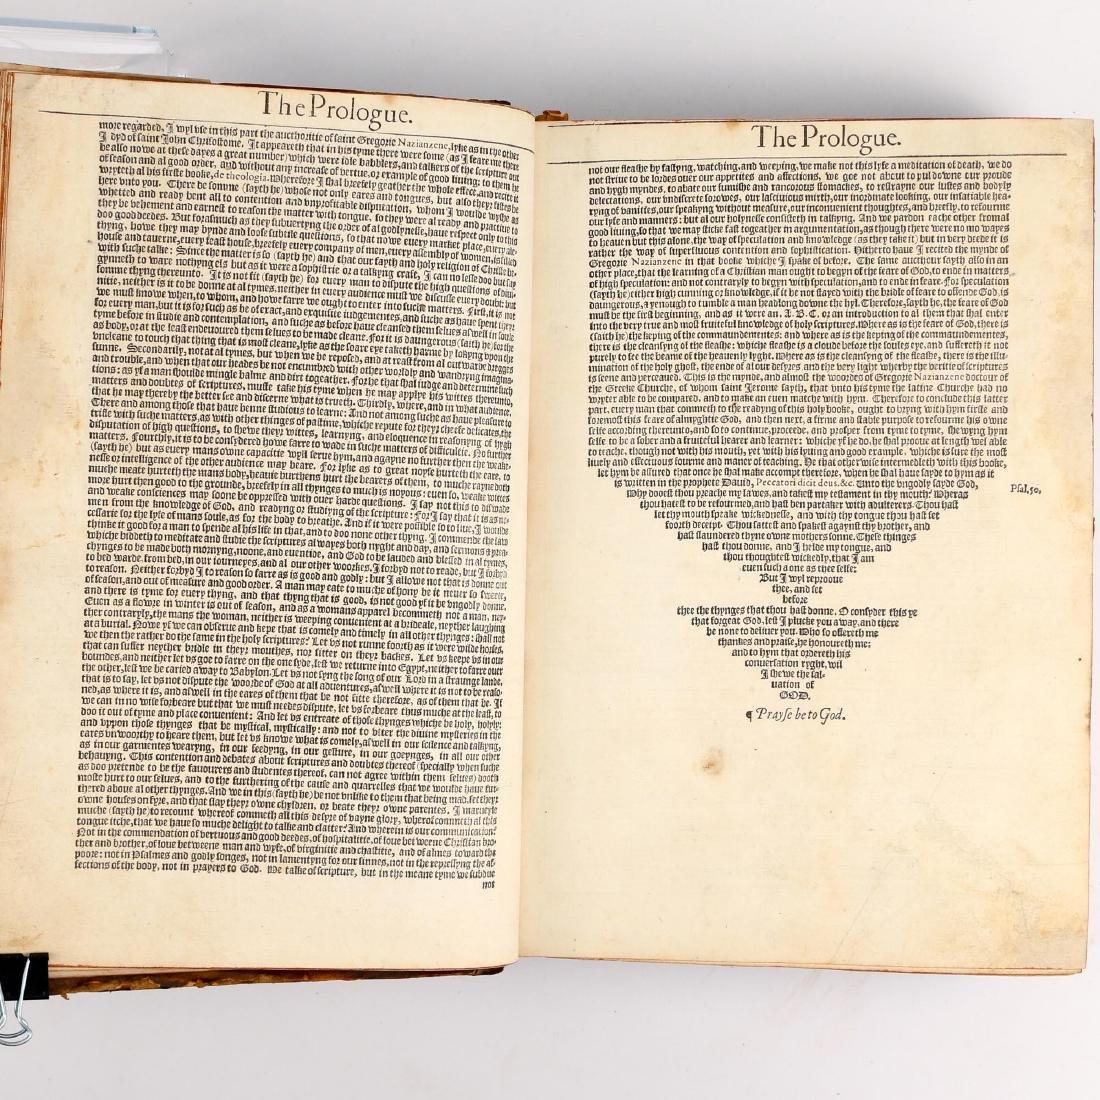 [FRANCIS FRY COPY] BISHOPS' BIBLE [1572] - 8